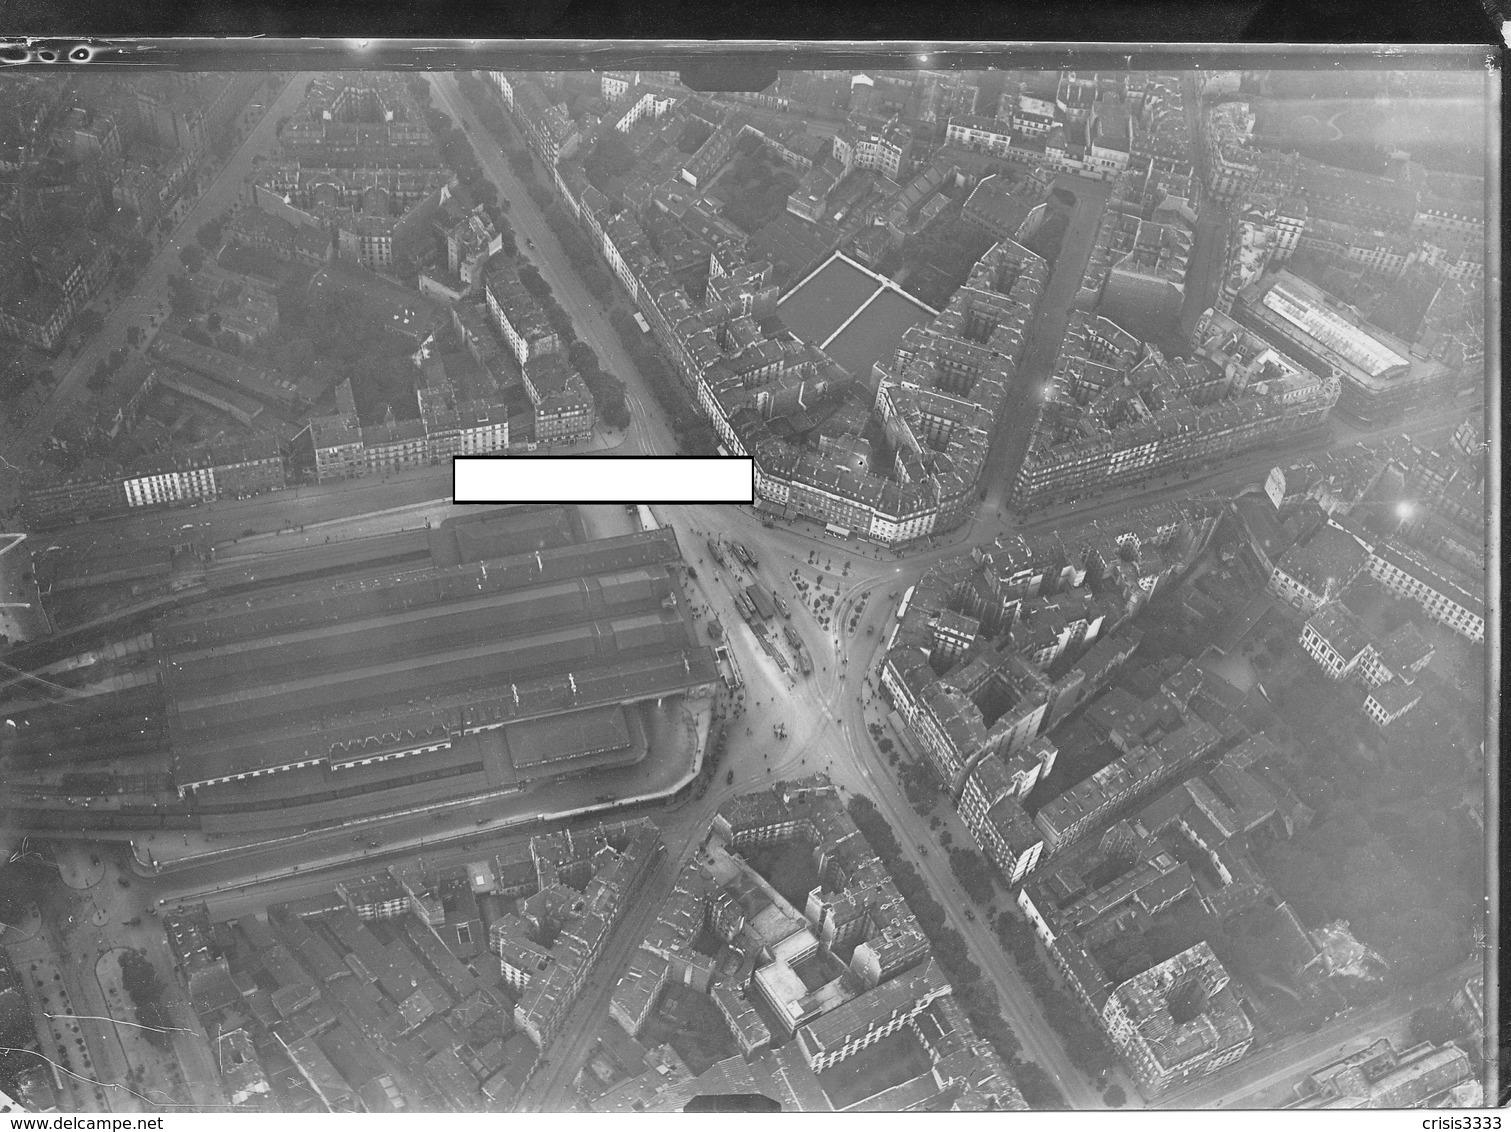 Gares parisiennes. Gare110